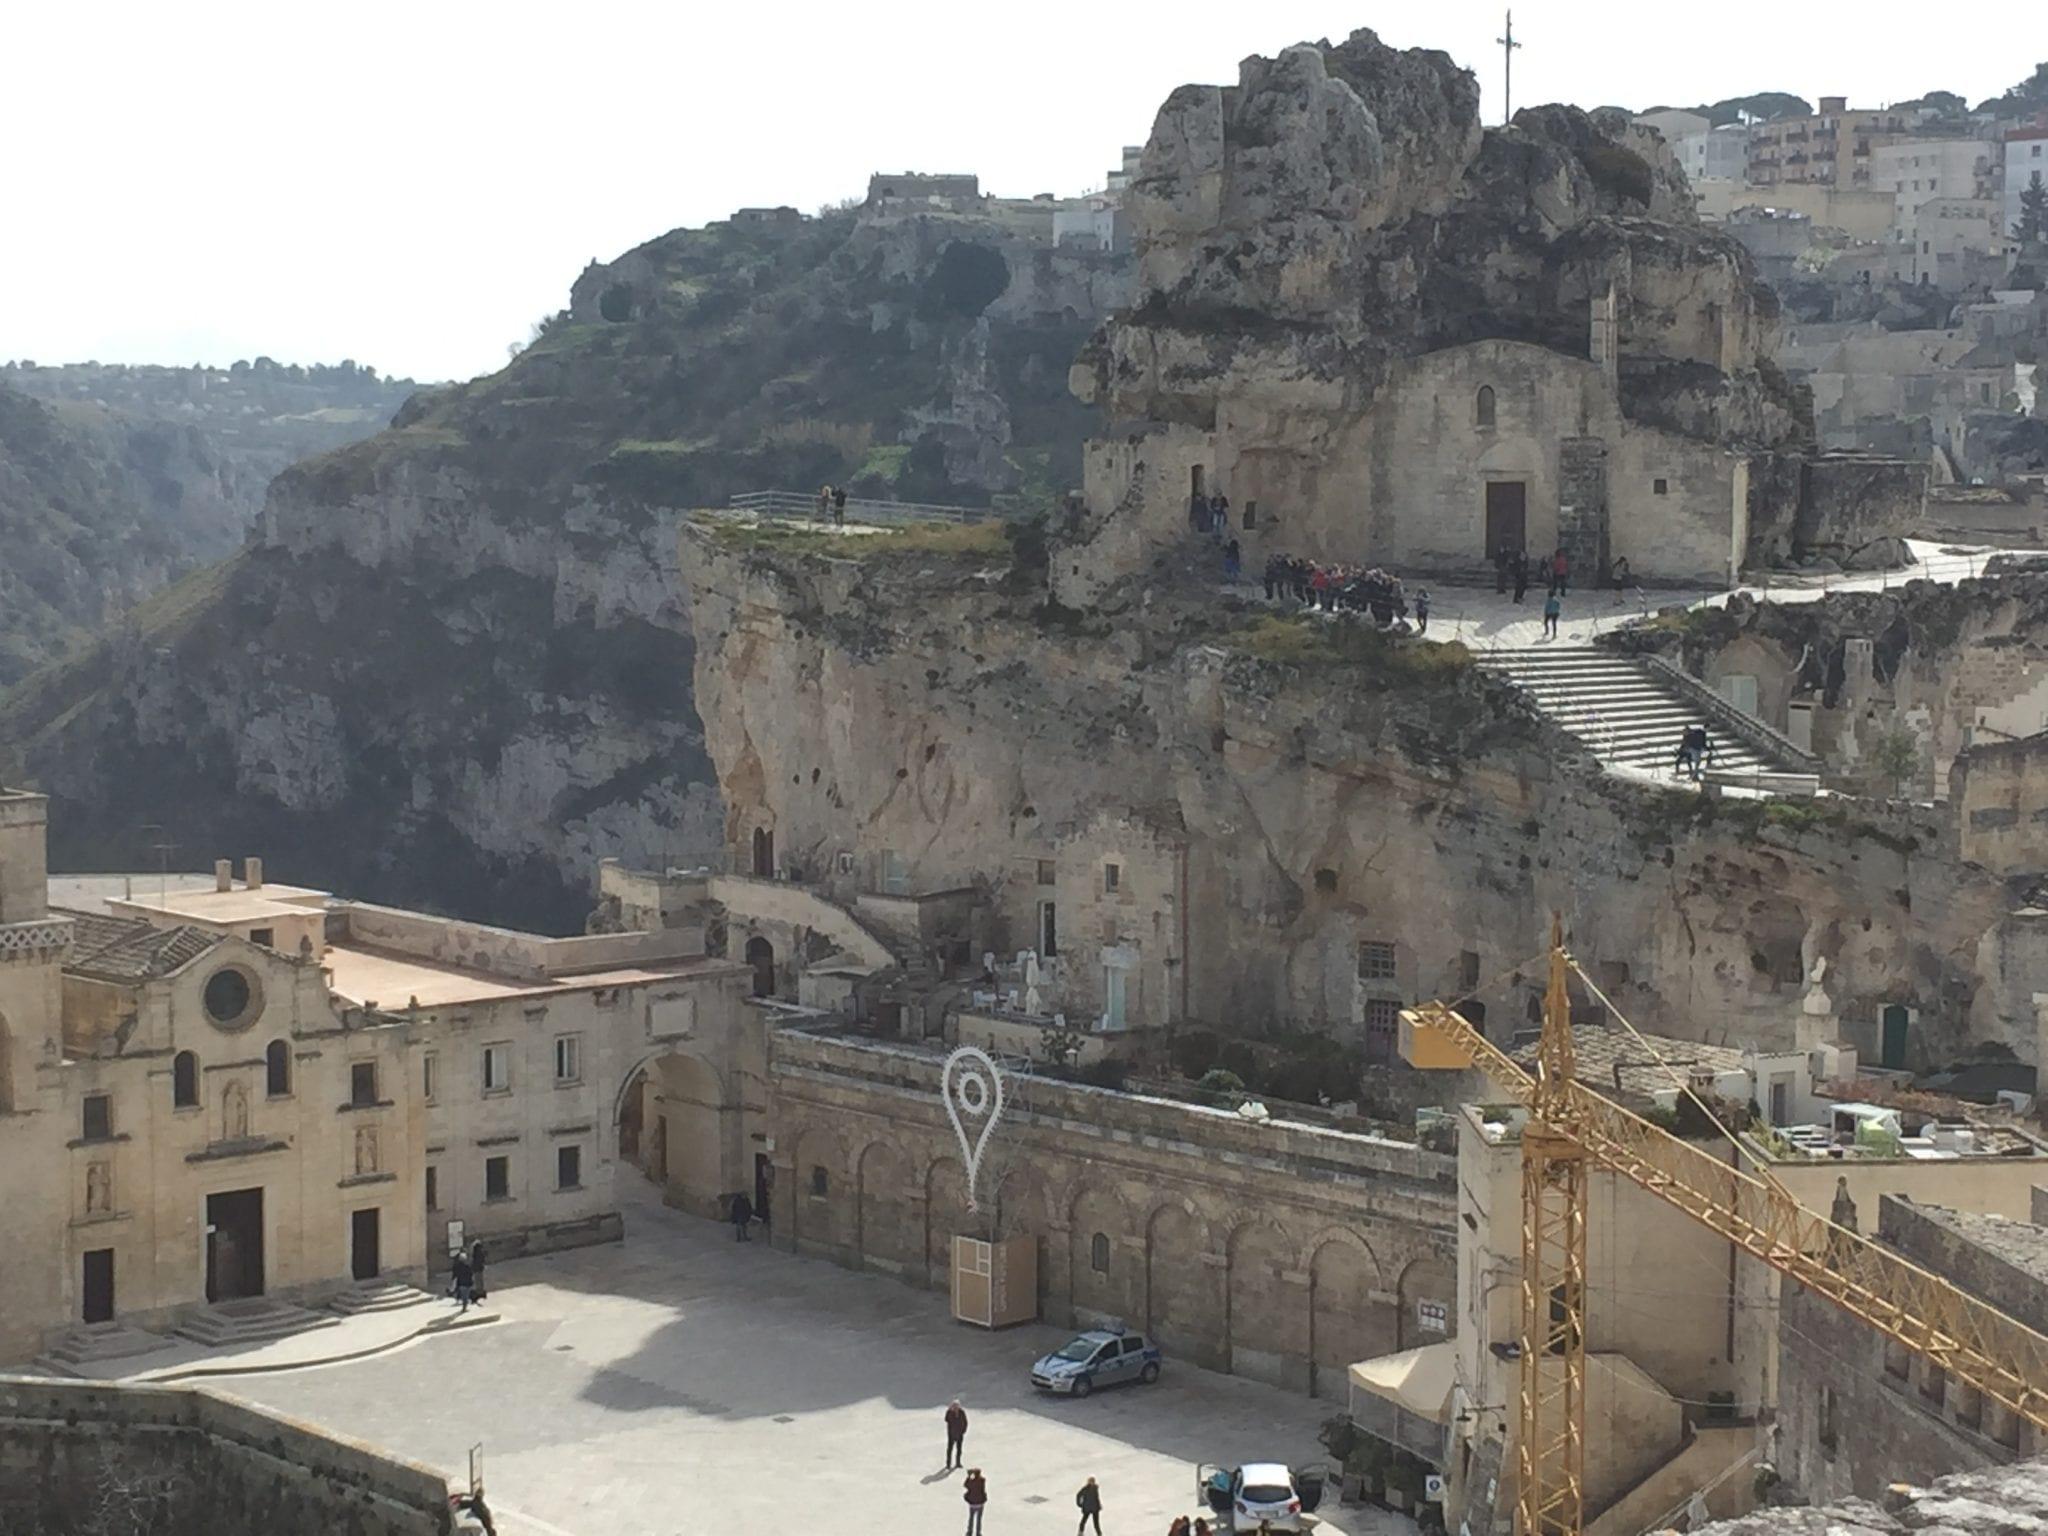 Splendori di Matera. Al via i restauri degli affreschi della chiesa rupestre di Santa Maria de Idris